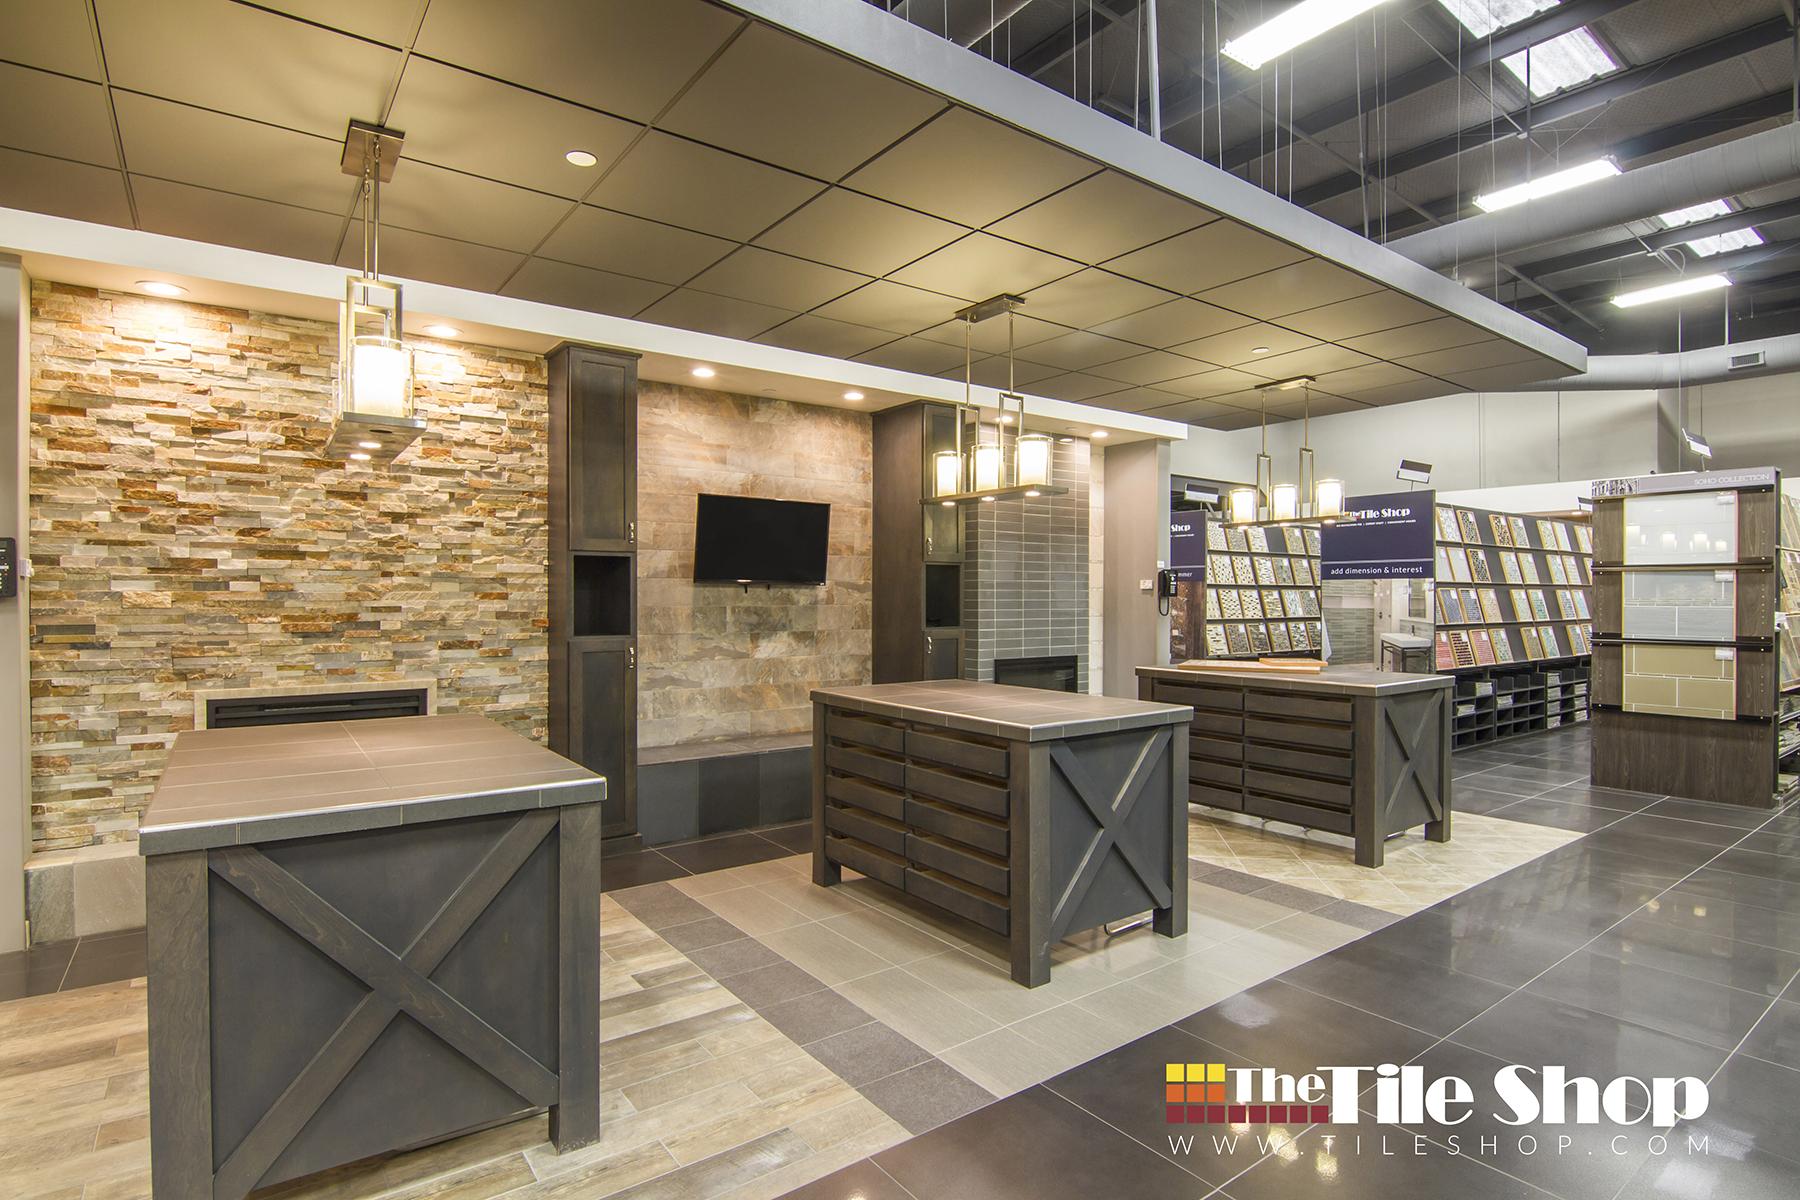 The tile shop manassas va 20109 for Eastern motors manassas va